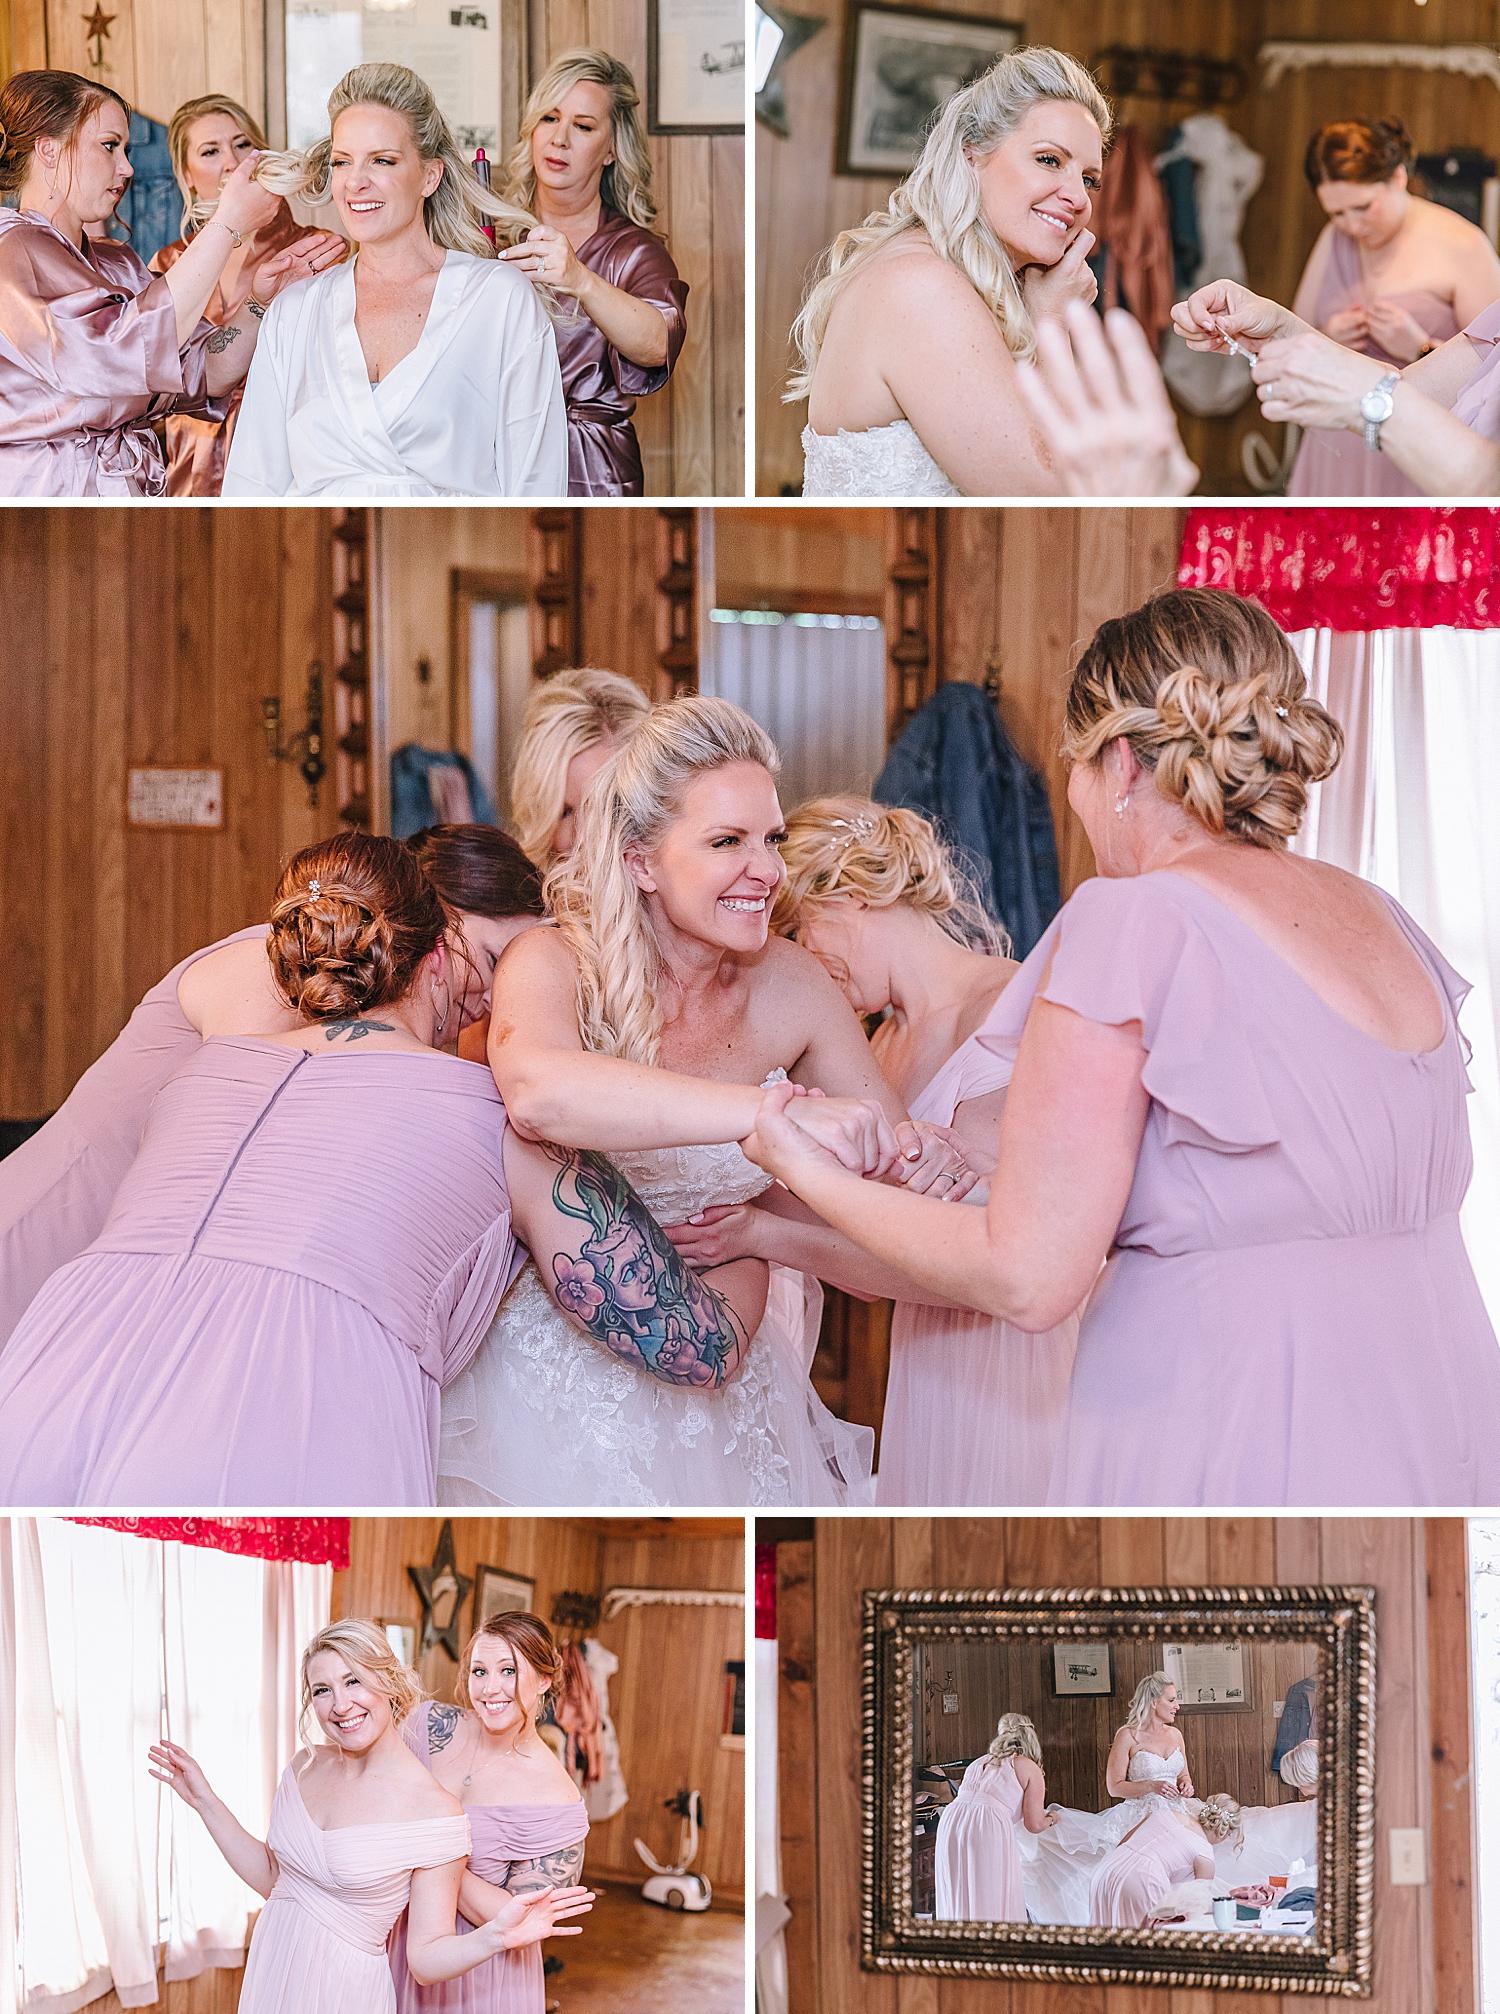 Rio-Cibilo-Ranch-Marion-Texas-Wedding-Rustic-Blush-Rose-Quartz-Details-Carly-Barton-Photography_0016.jpg